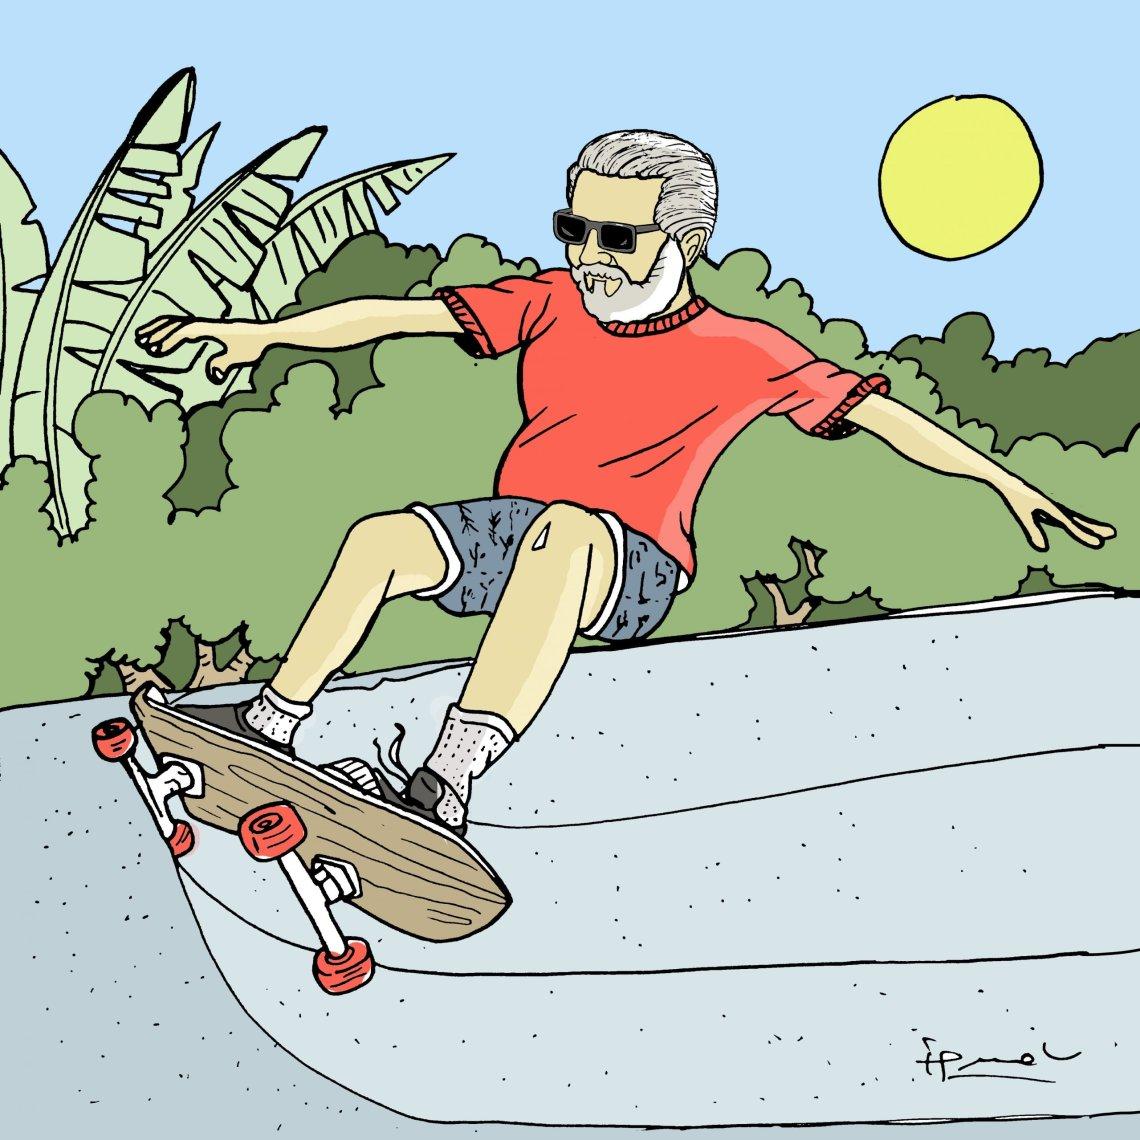 Jim Gray Skateboarder